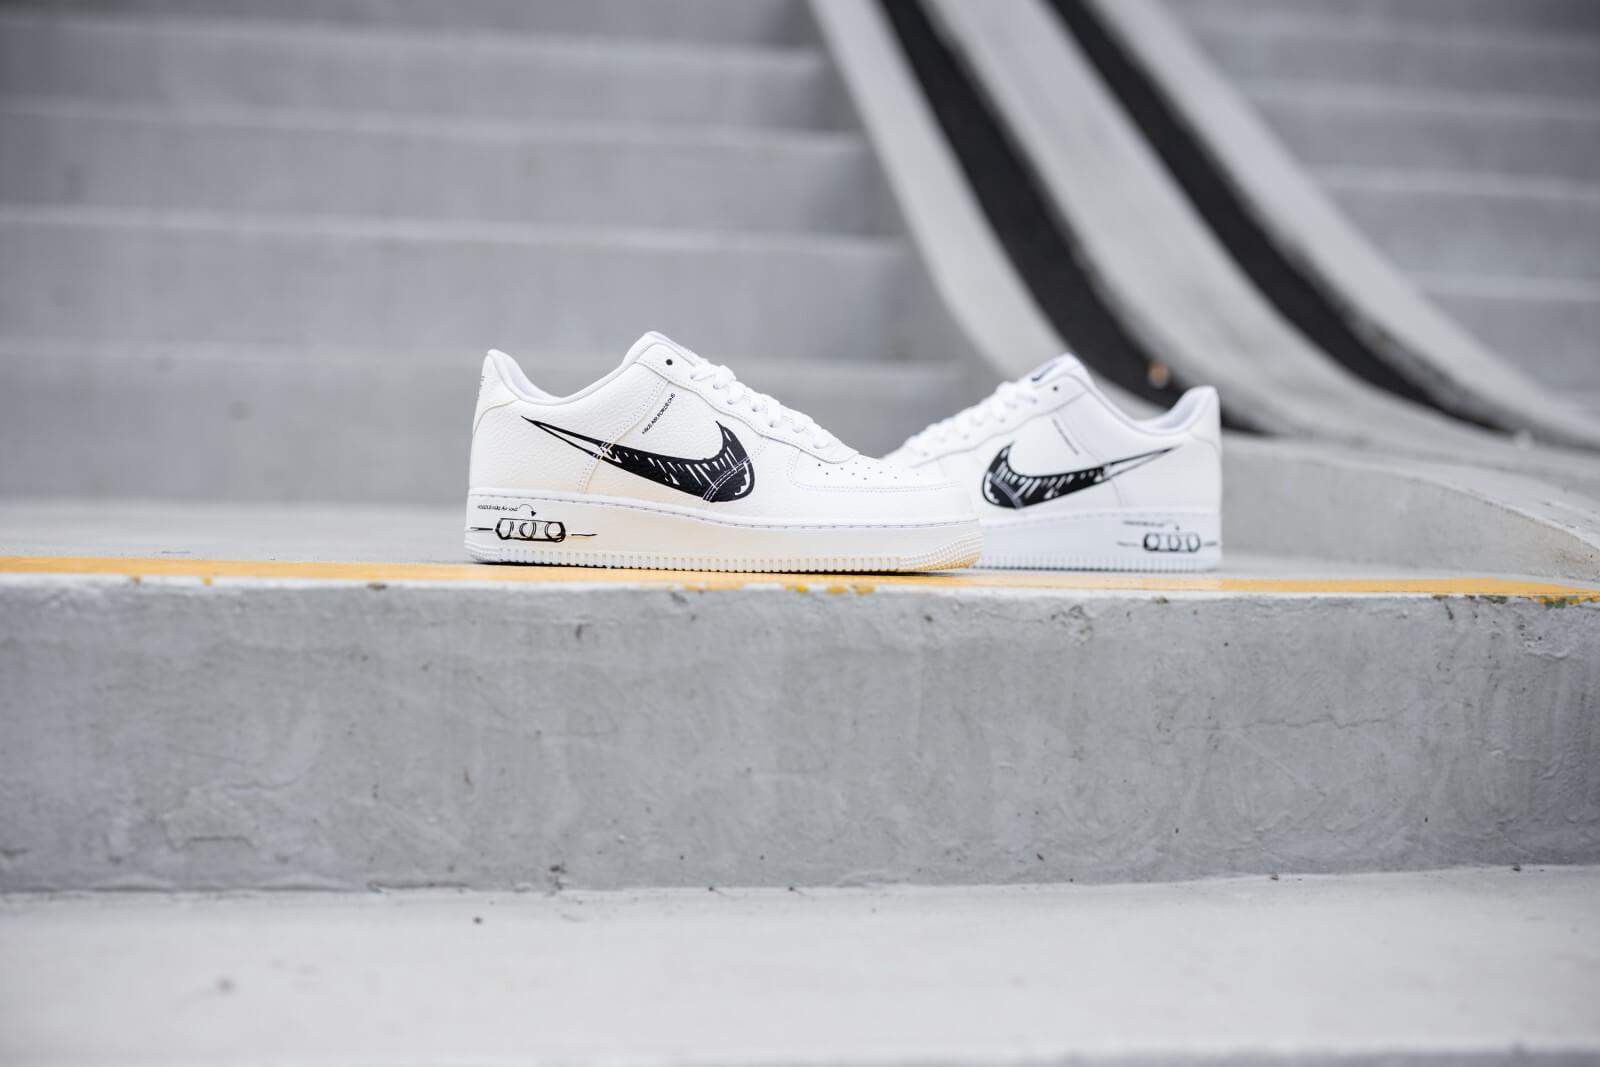 Críticamente sarcoma Impedir  Nike Air Force 1 LV8 Utility Sketch White/Black-White - CW7581-101